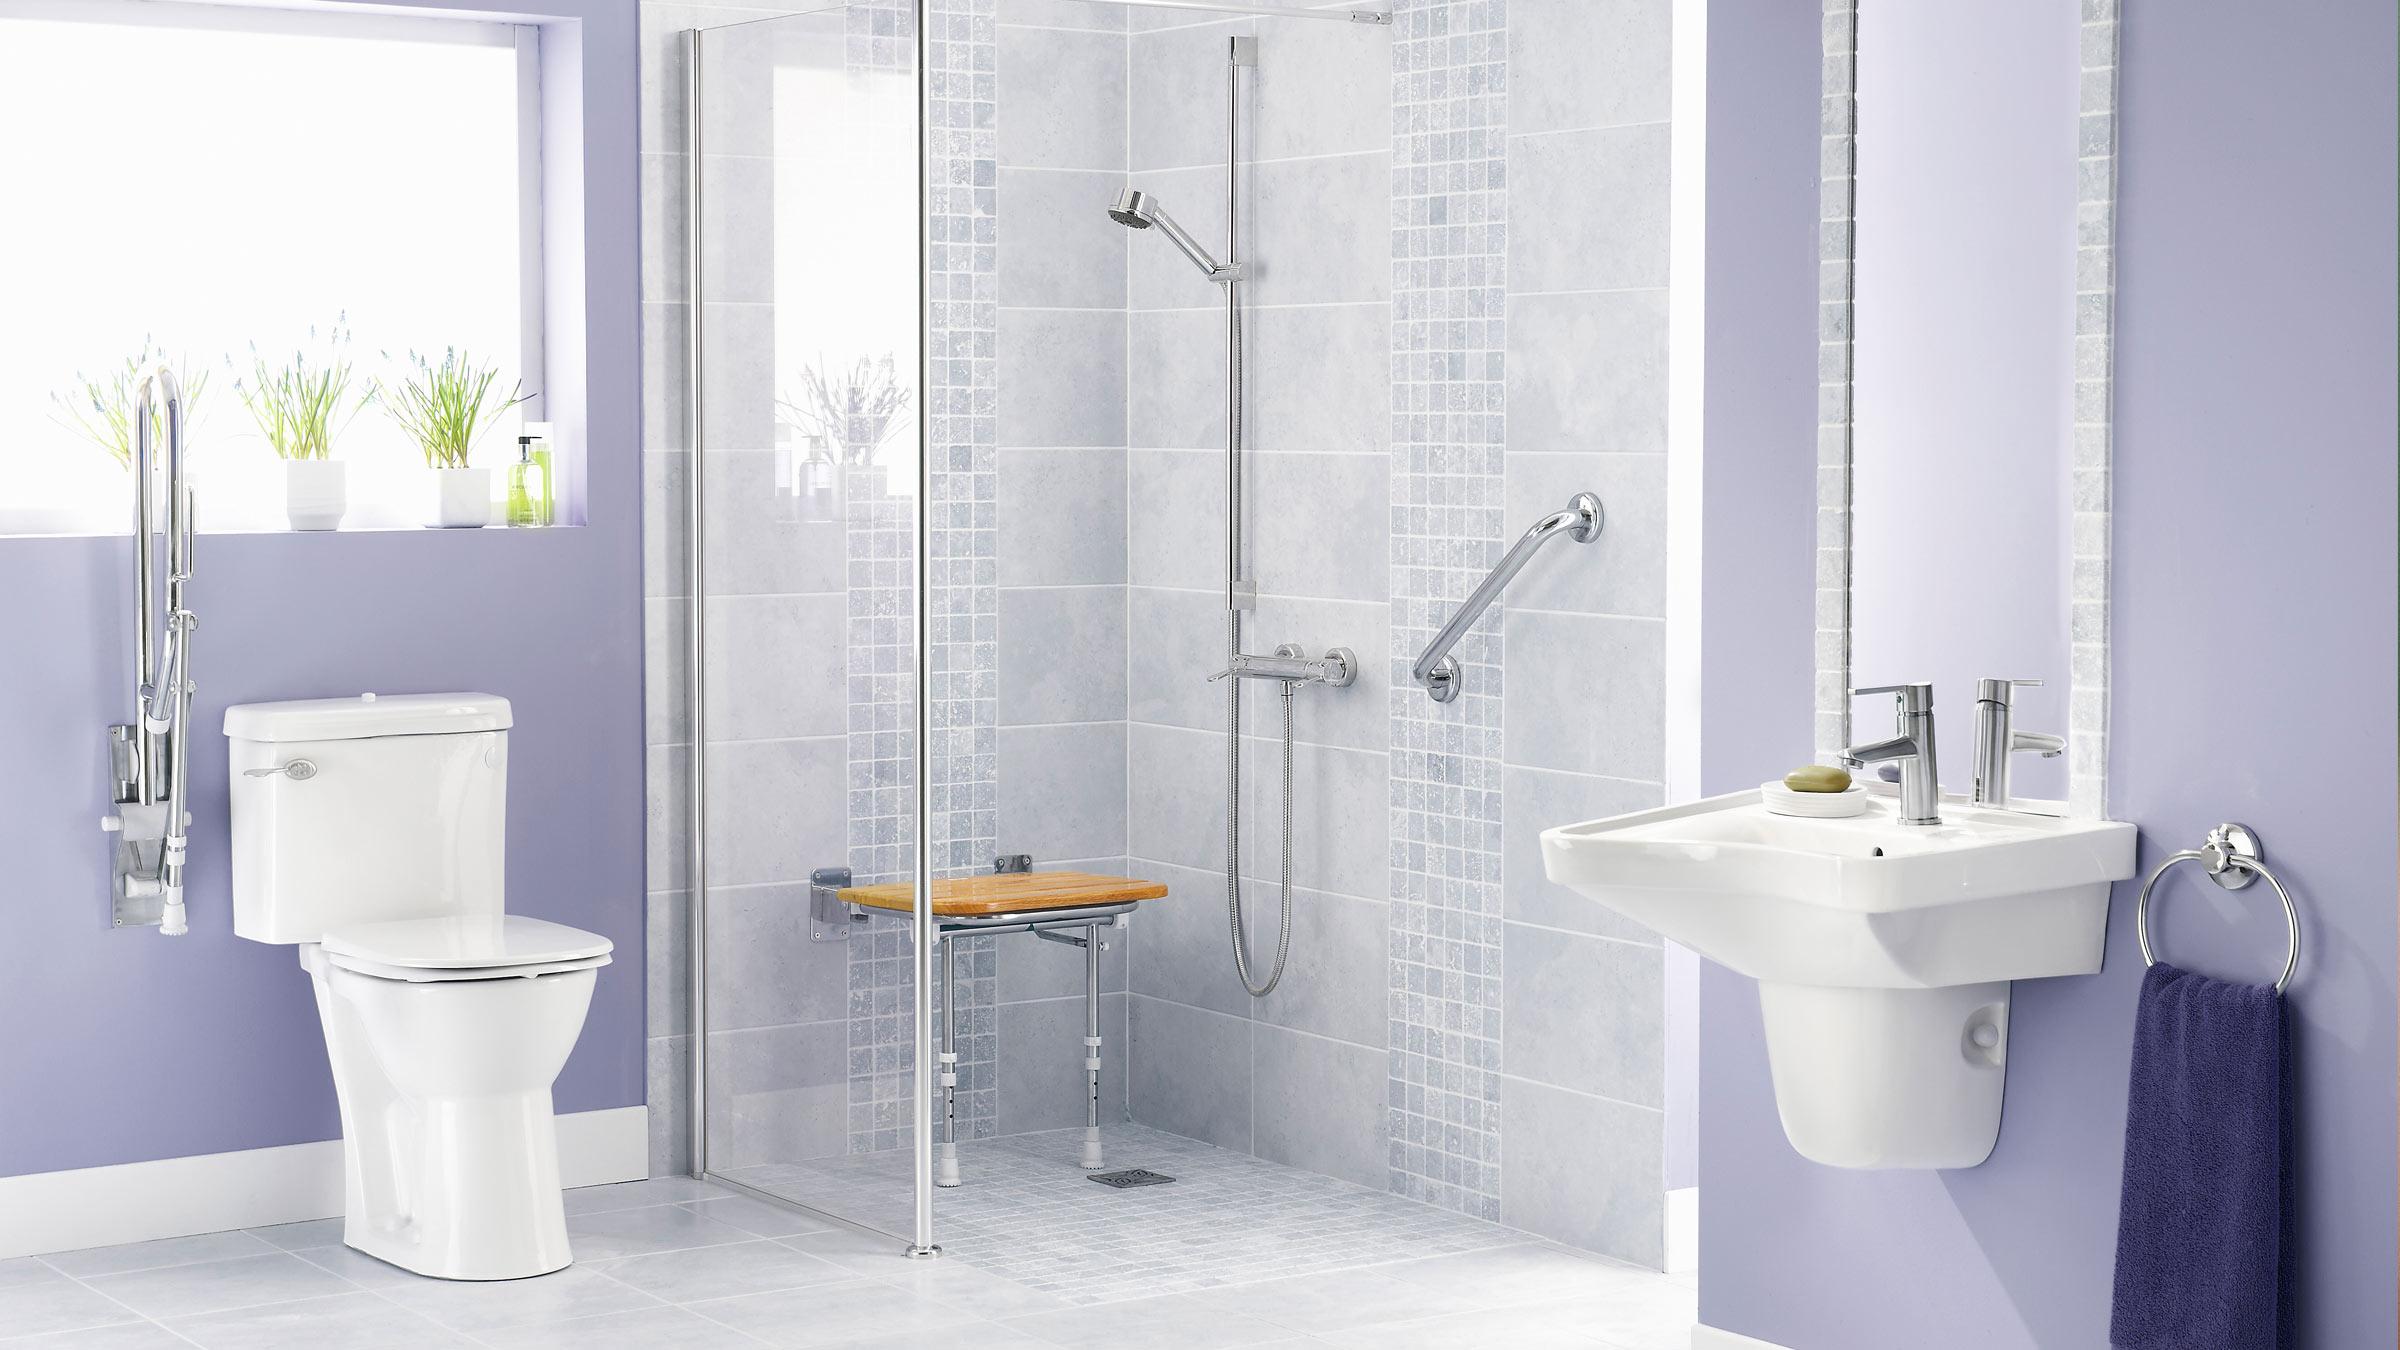 Vasca Da Bagno Per Disabili Dimensioni : Ausili per disabili per il bagno per usarlo in serenità e